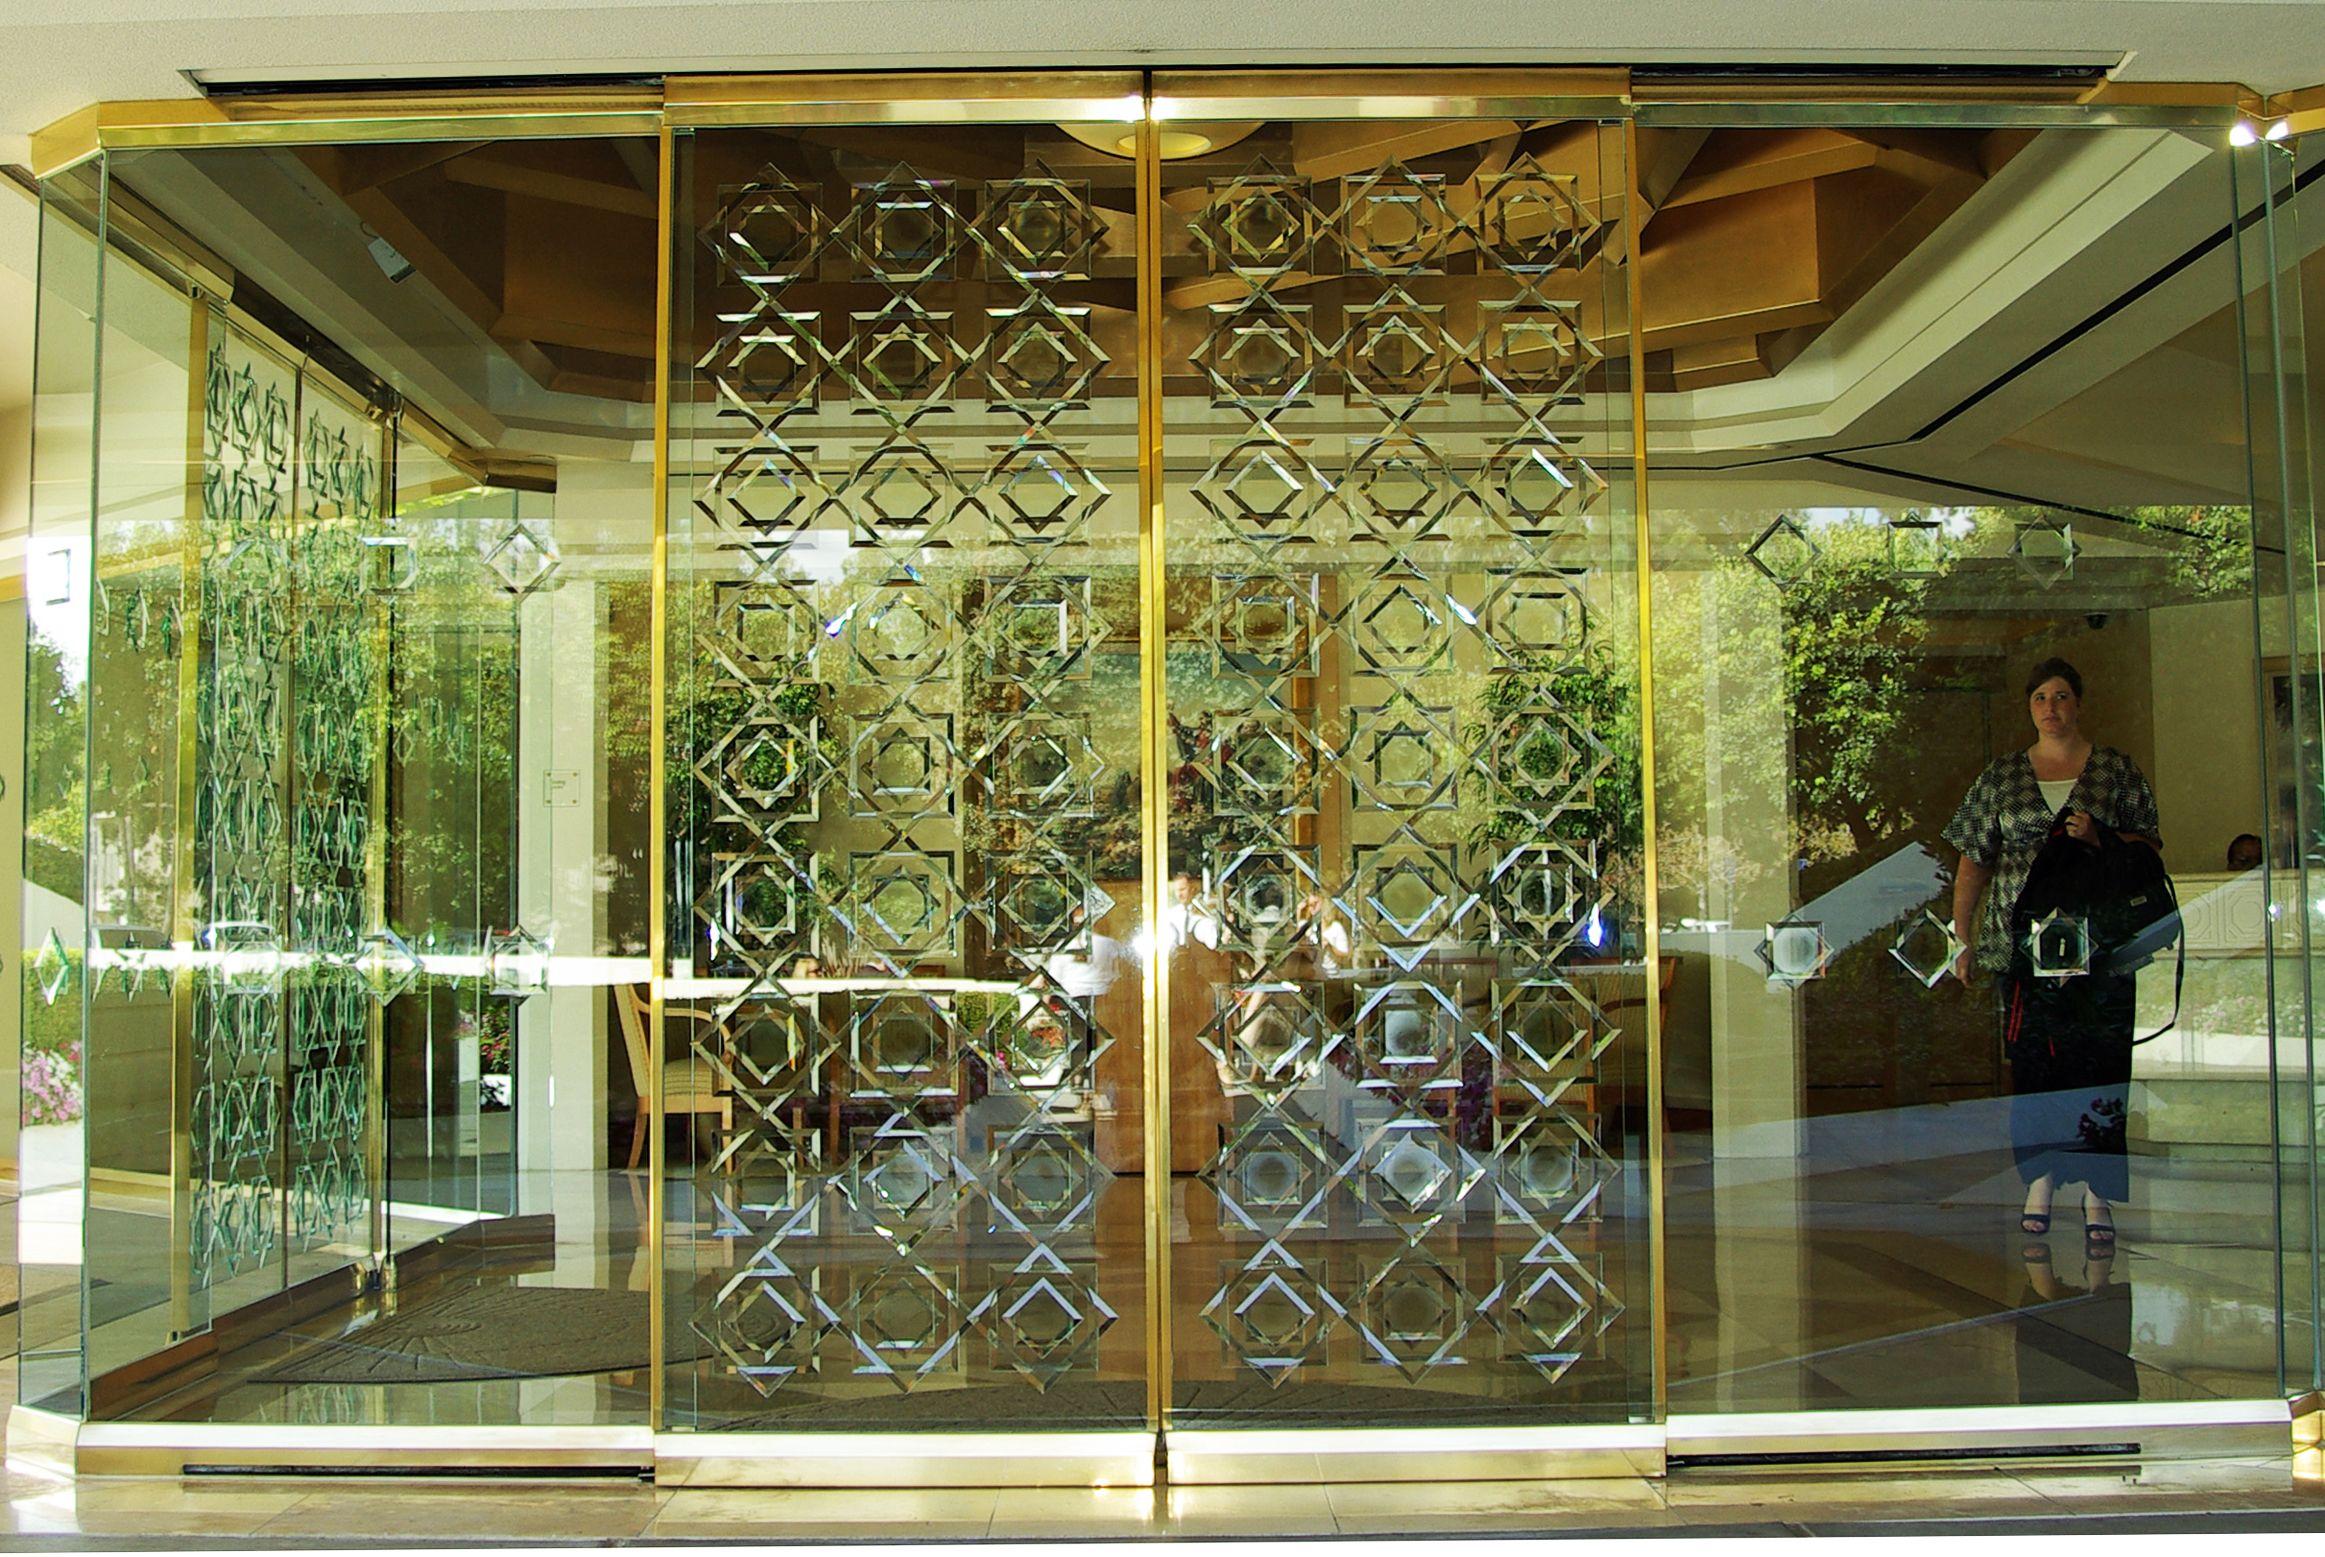 San diego lds temple glass front doors seal of melchizedek symbol san diego lds temple glass front doors seal planetlyrics Images